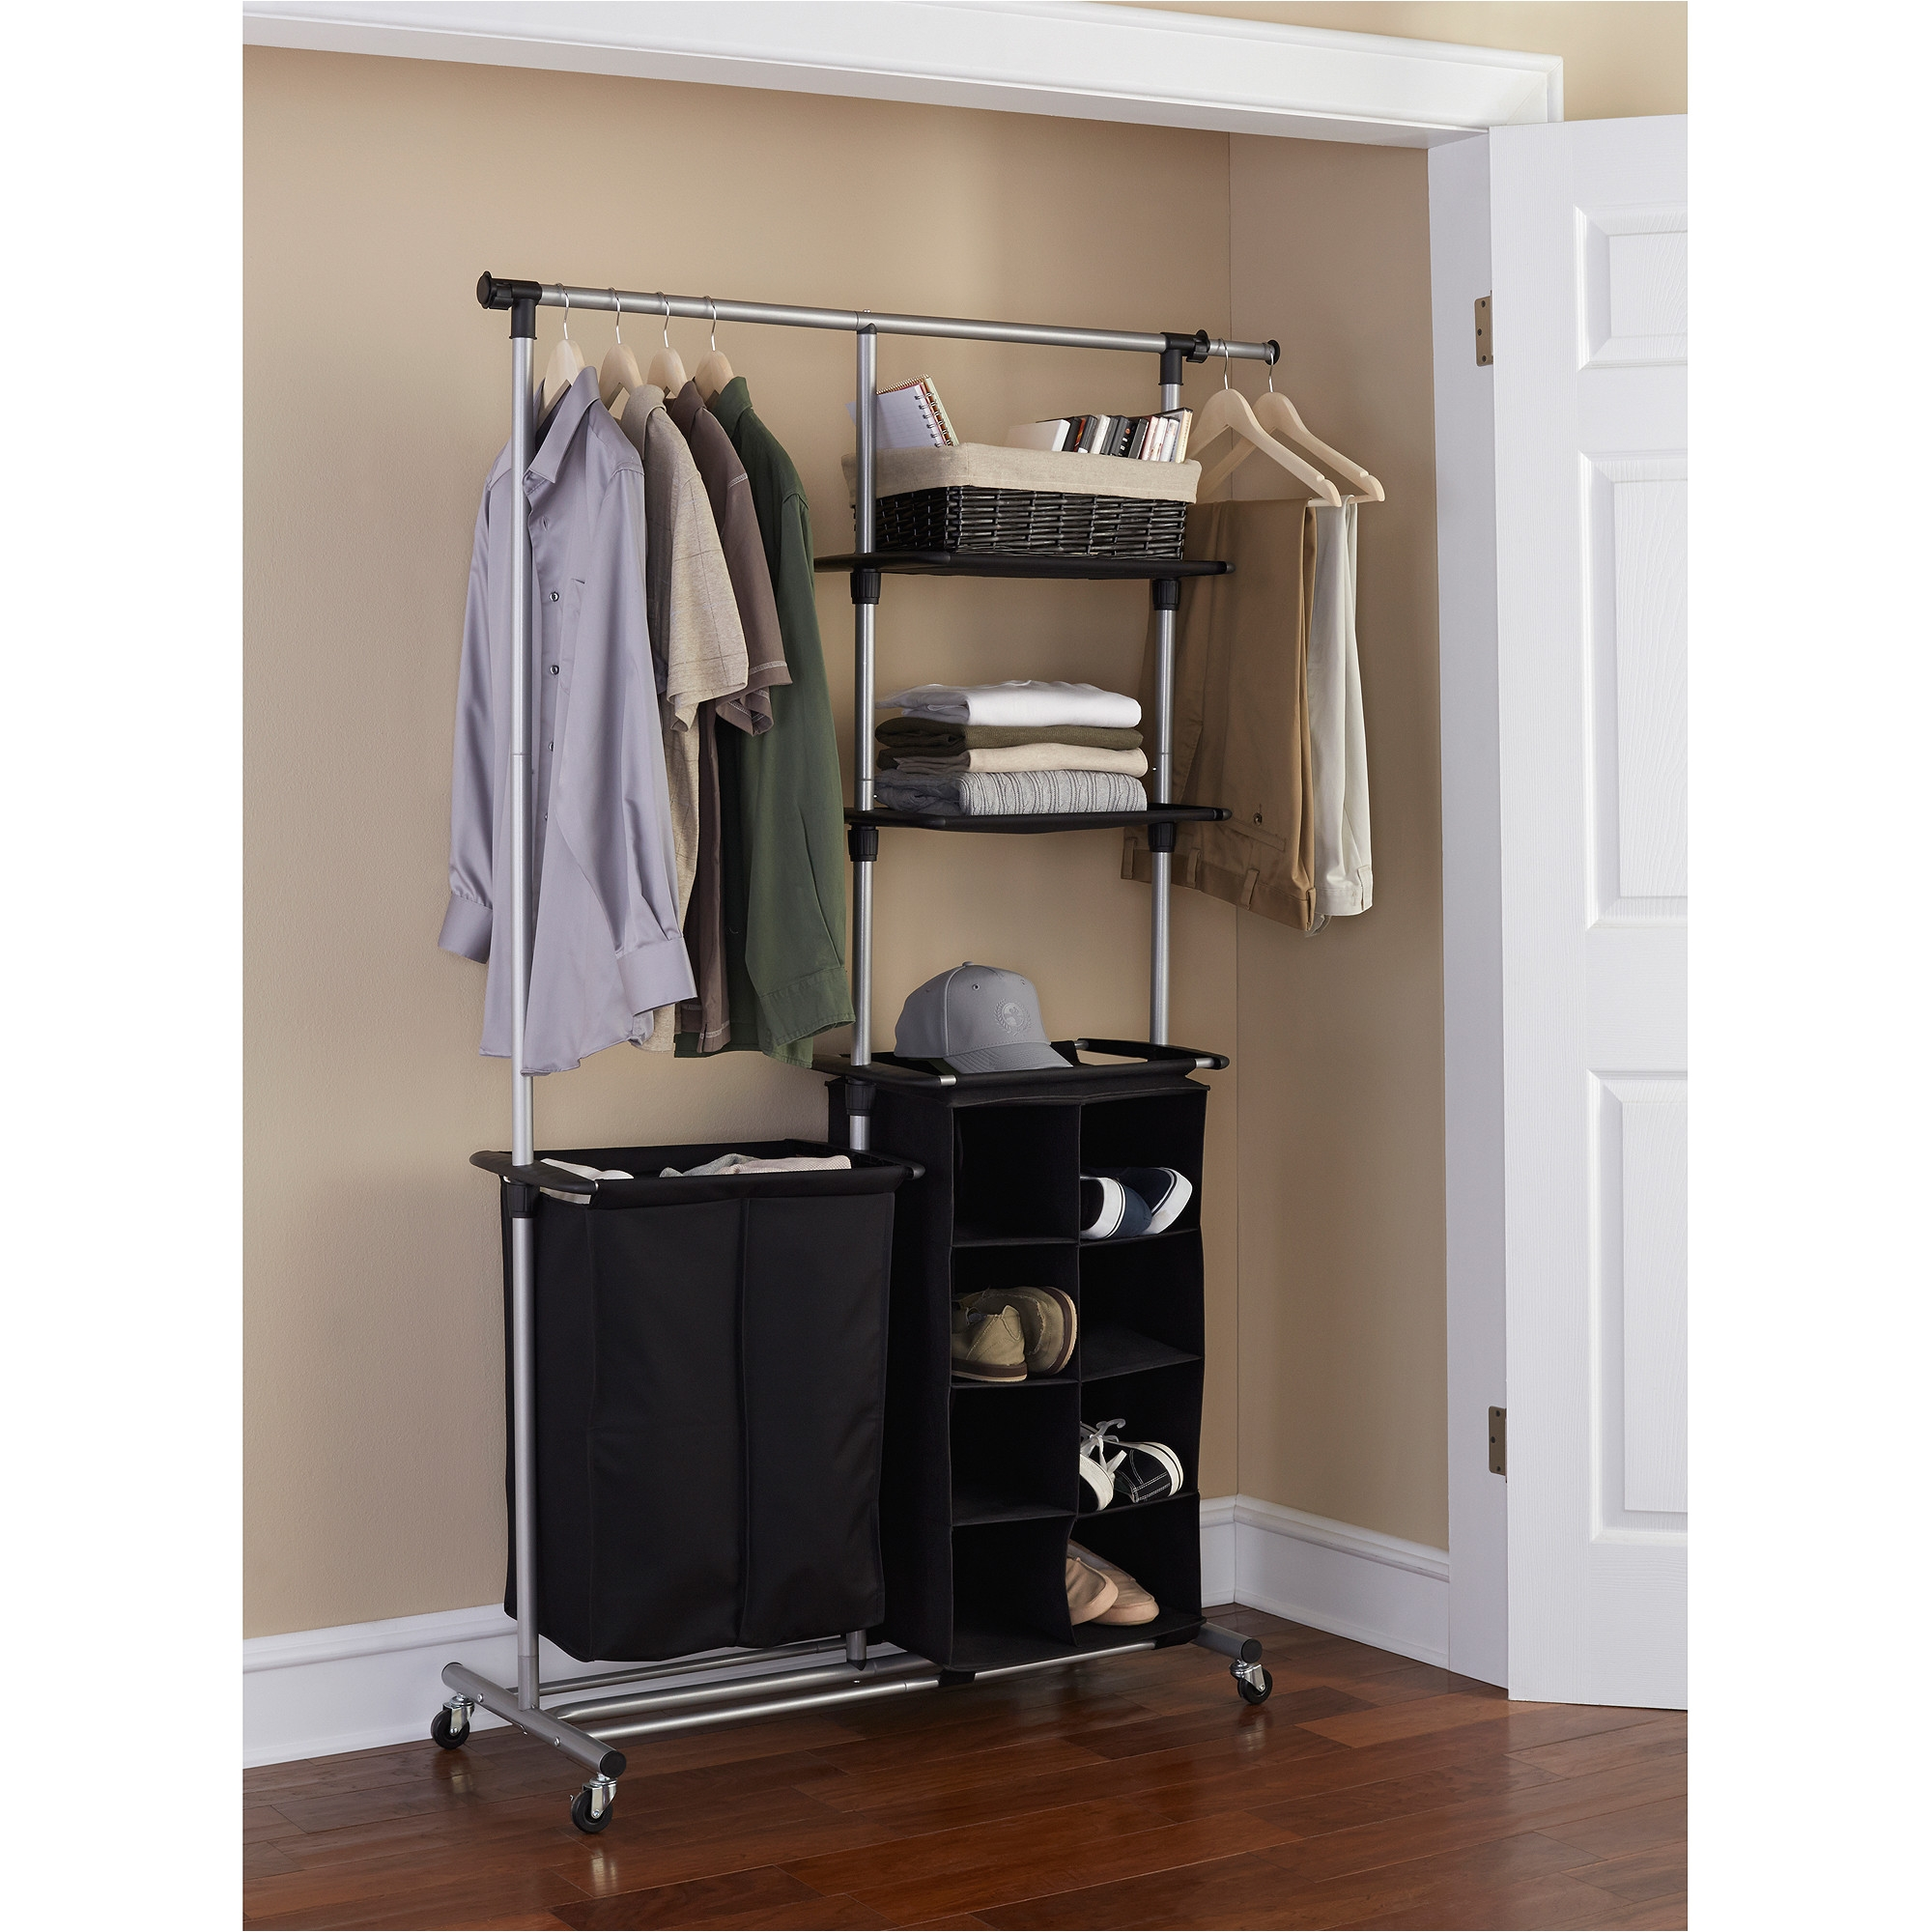 clothes rack organizy a937f535 6385 4e28 a880 b844874539f6 2 wardrobe walmart rack i 3d